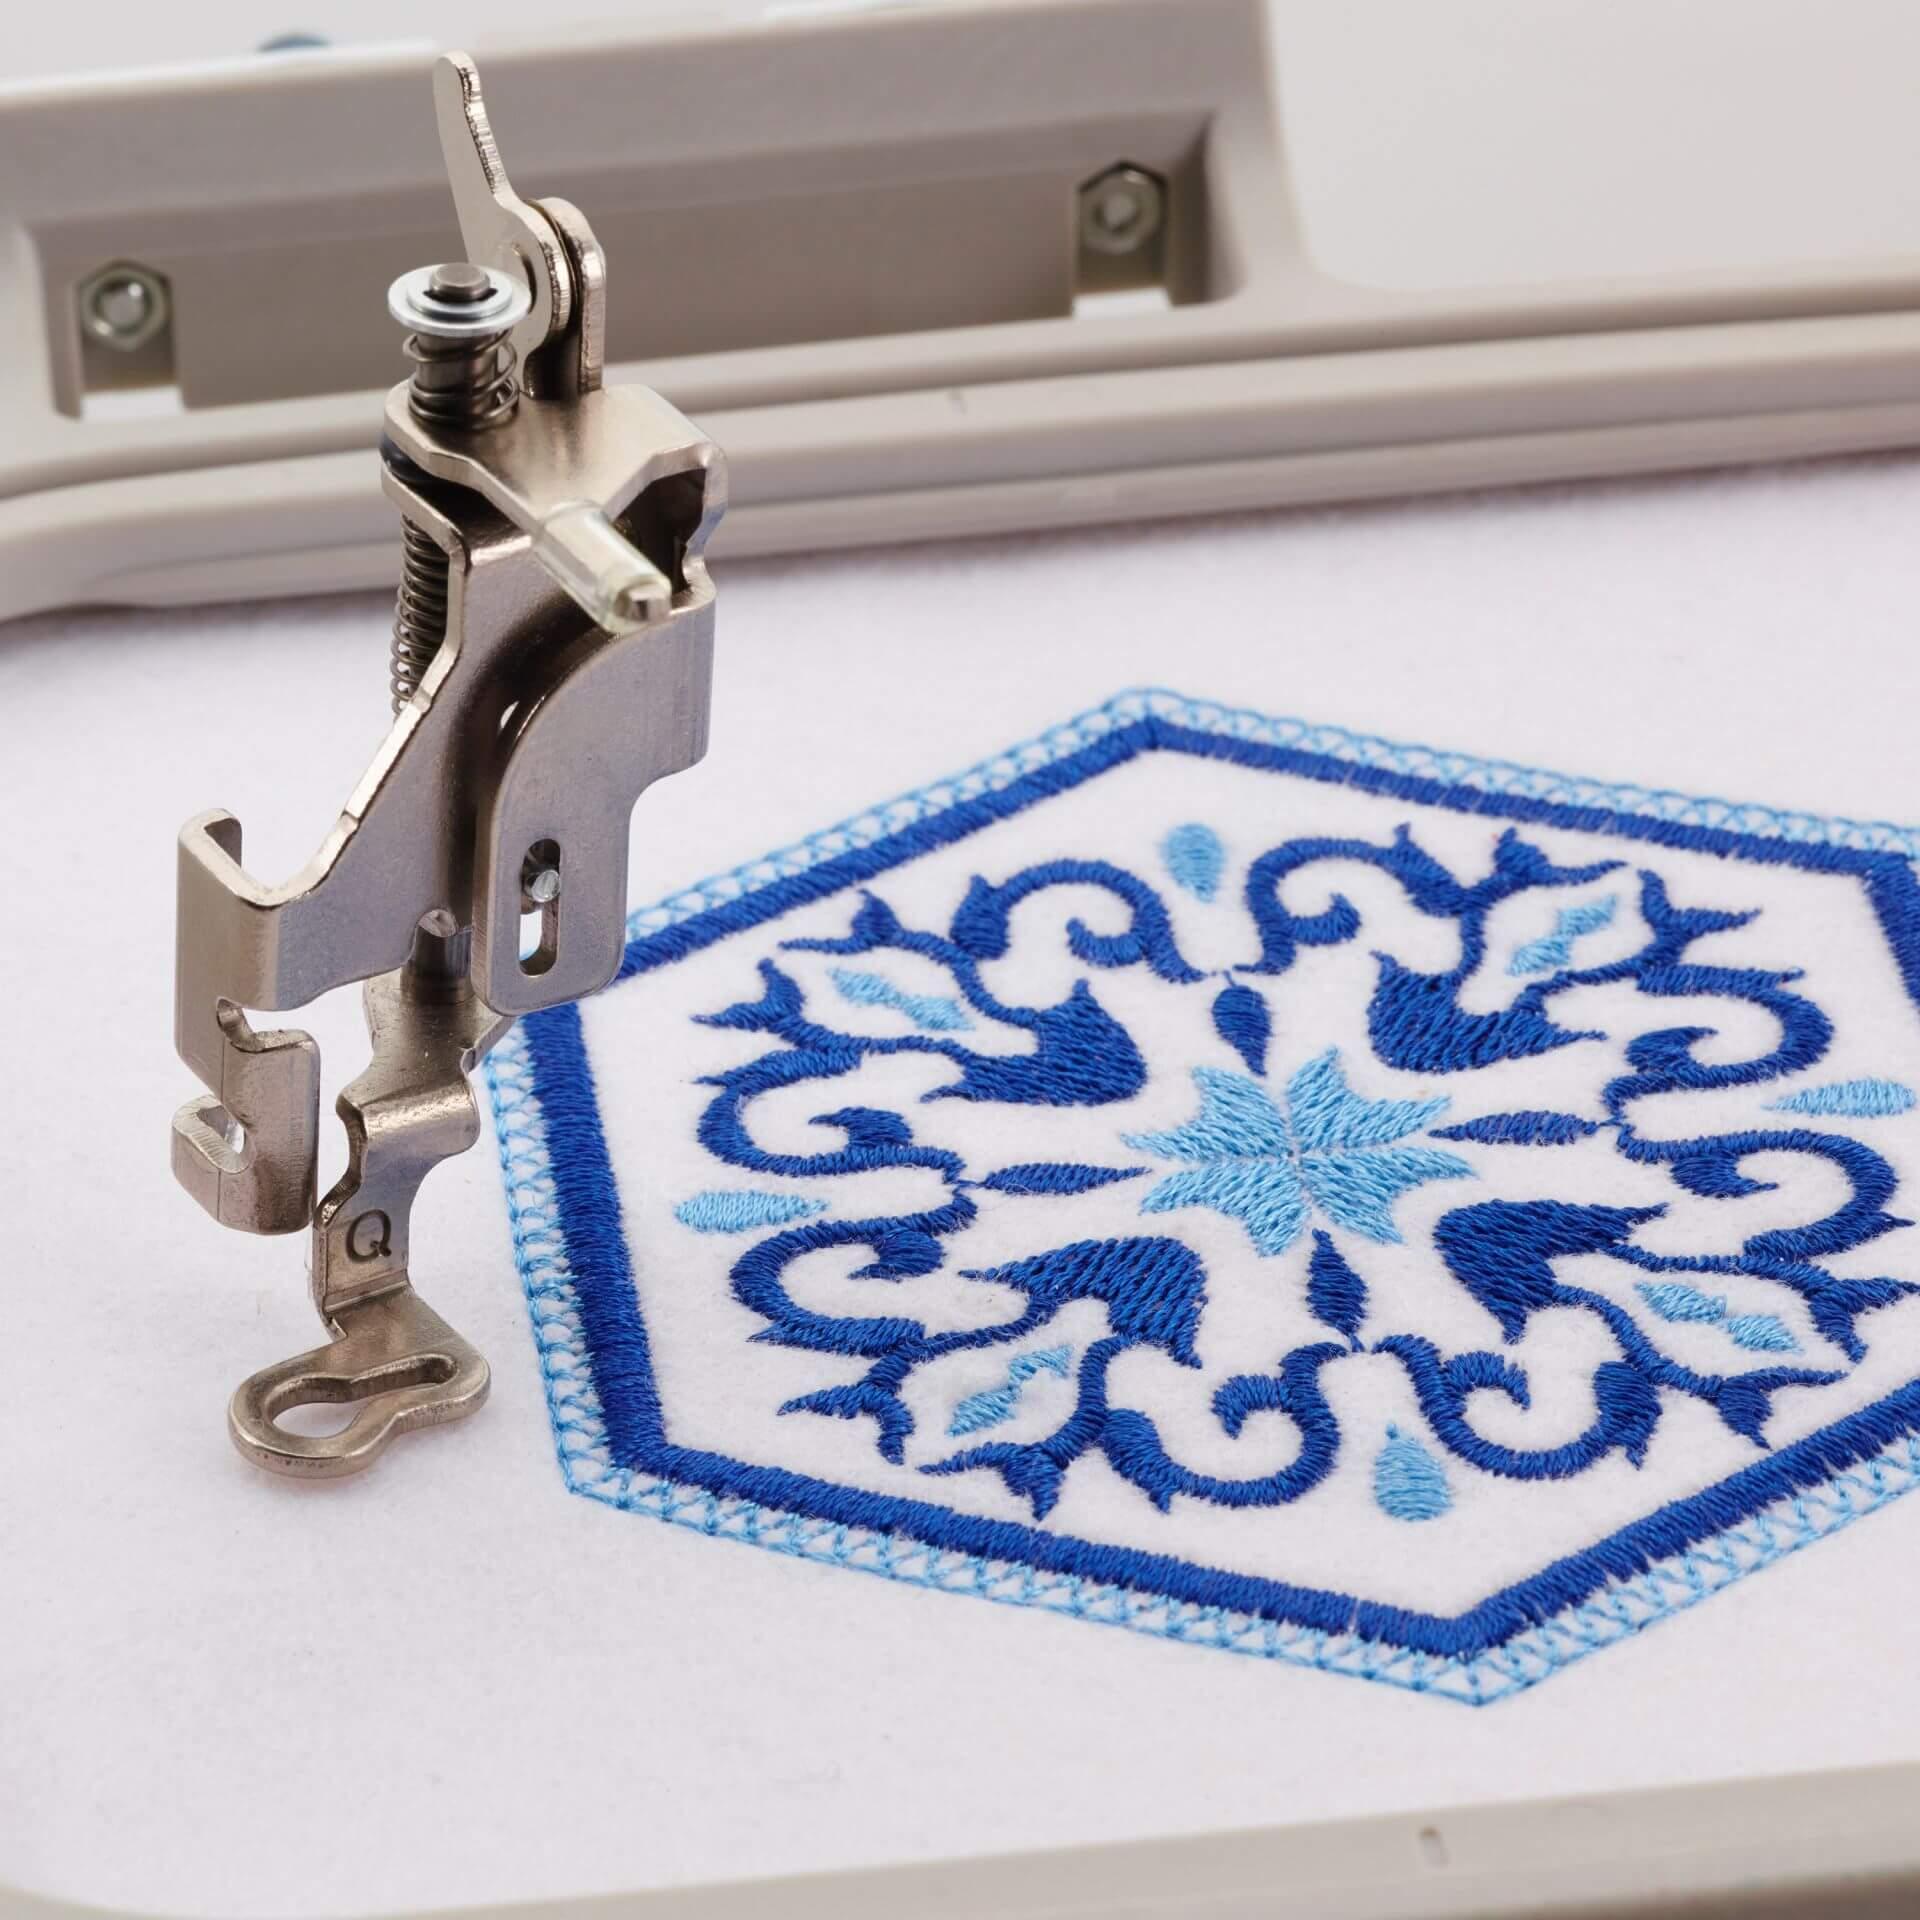 pe535 brother embroidey machine